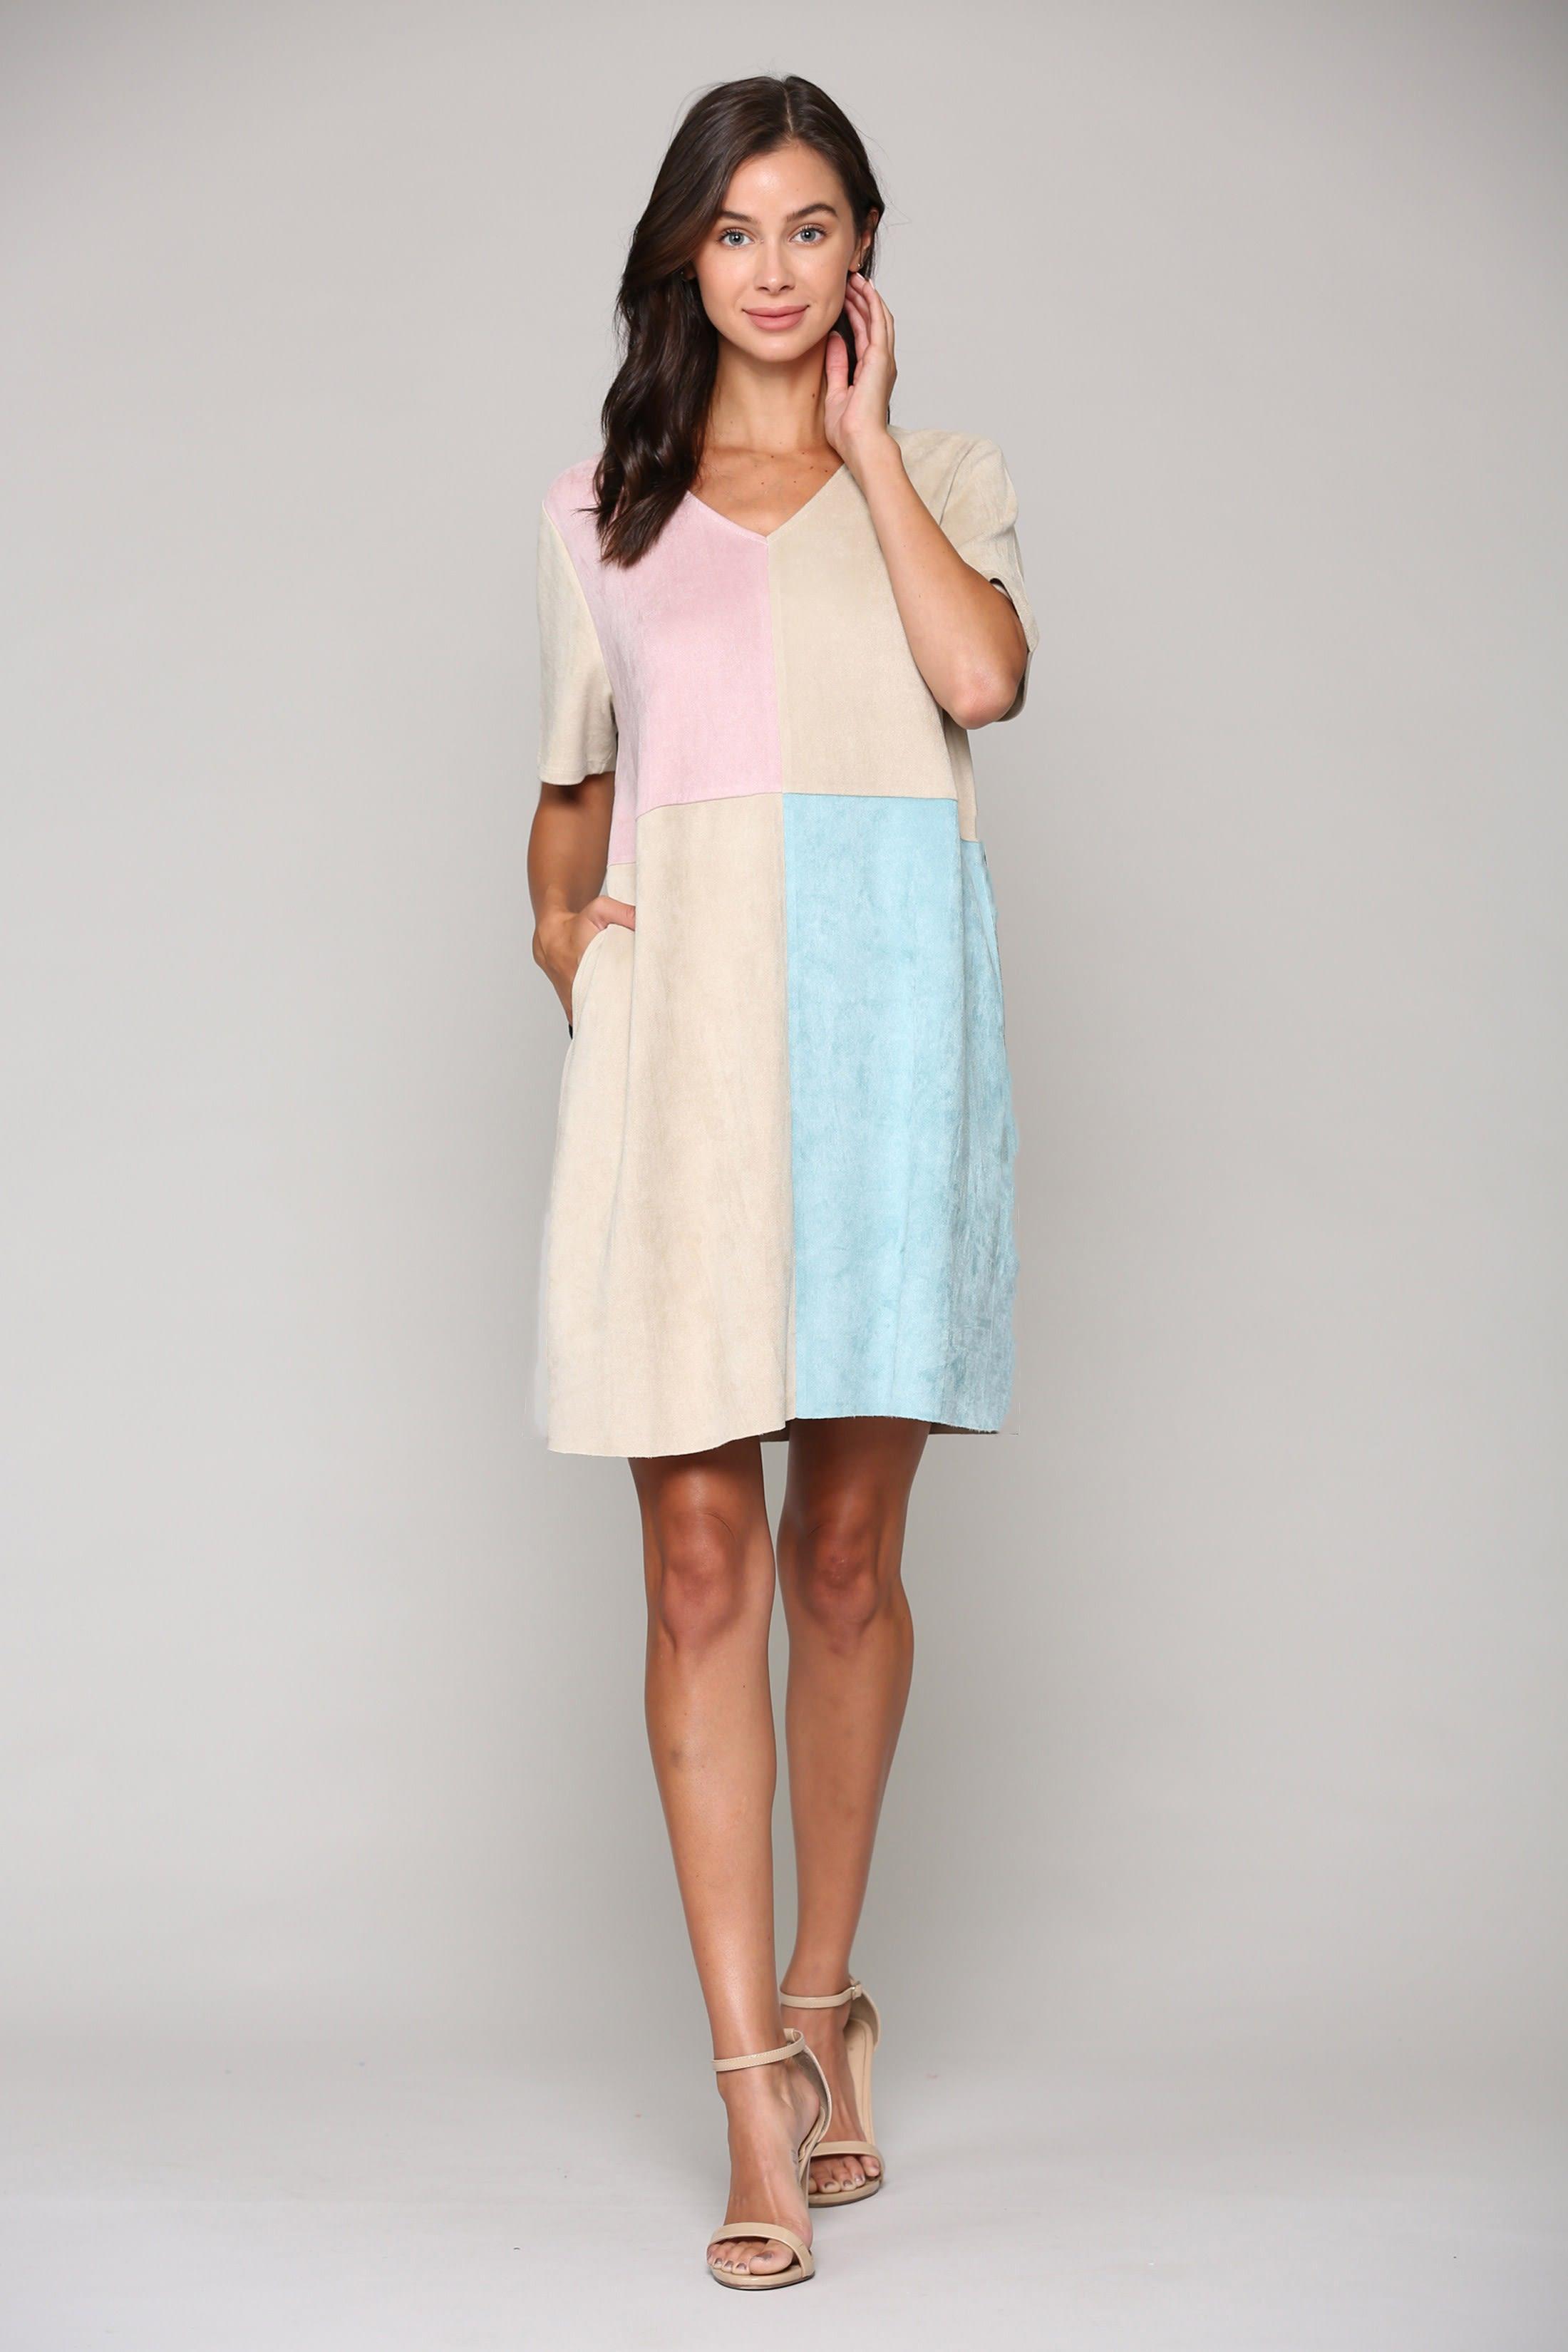 Annelise Multi-Color Tunic Dress -  - Front